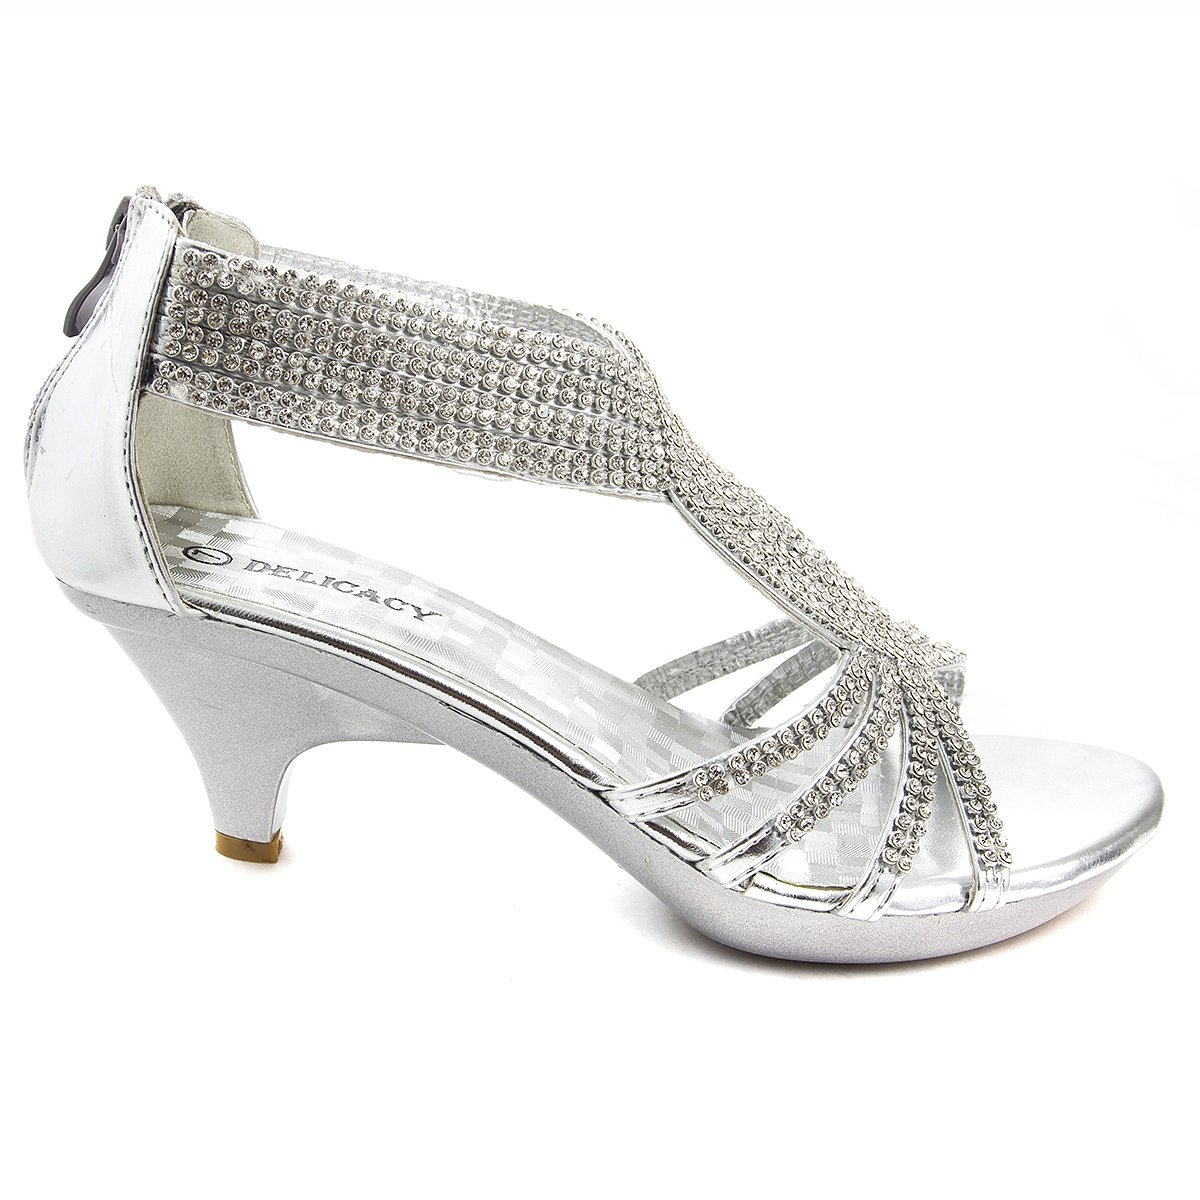 47278976eee955 V-Luxury Womens 32-ANGEL37 Open Toe Med Heel Wedding Sandal Shoes   Amazon.ca  Shoes   Handbags